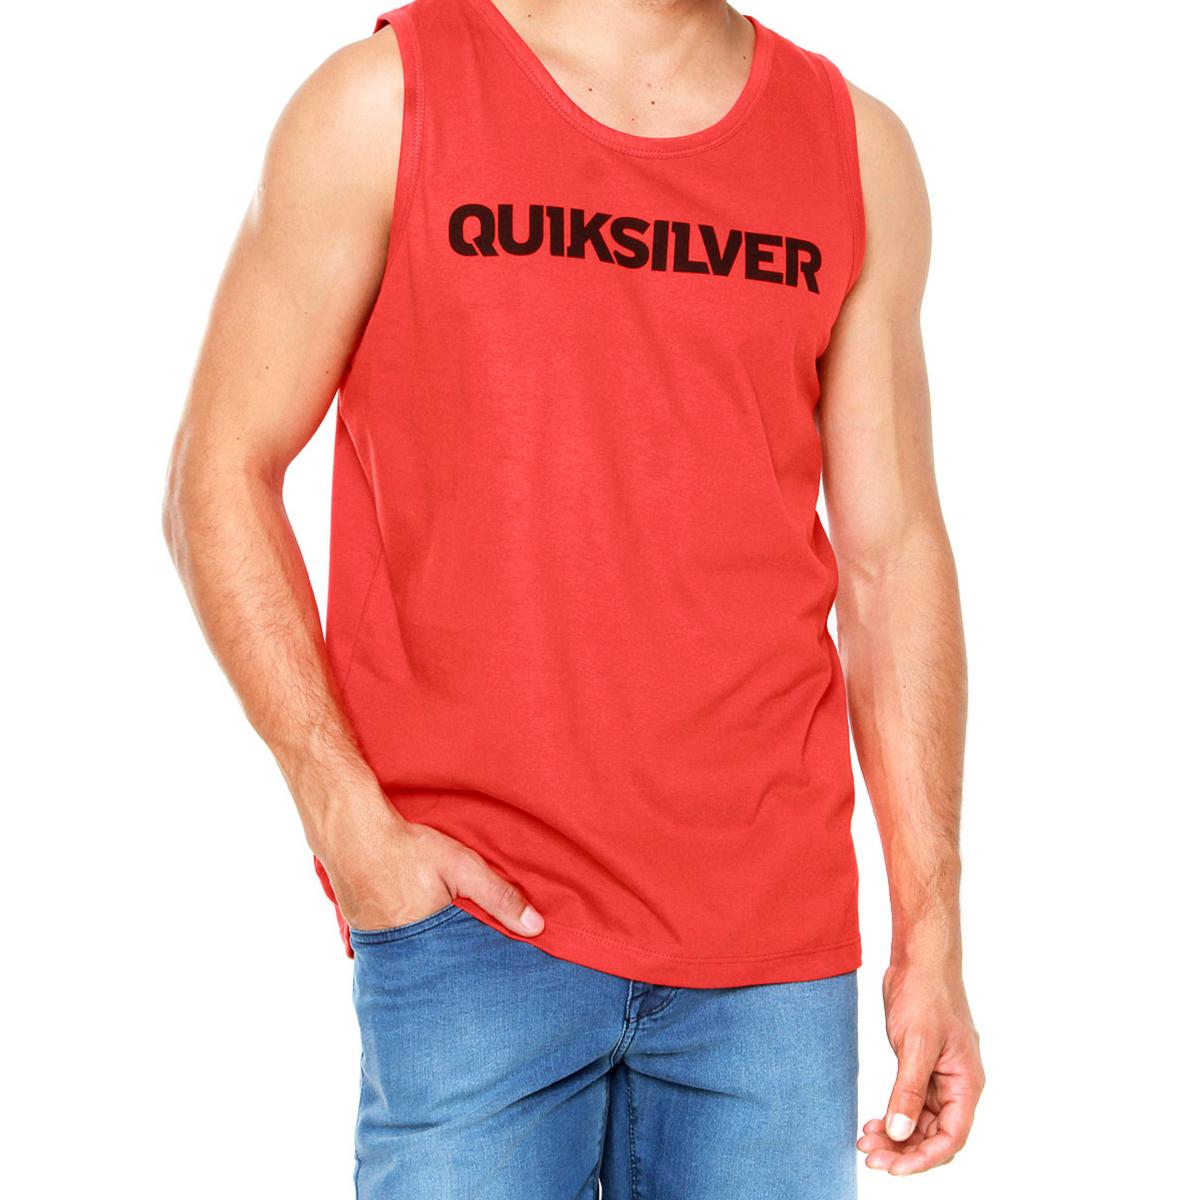 Camiseta Regata Quiksilver High Voltage Masculina - Vermelha